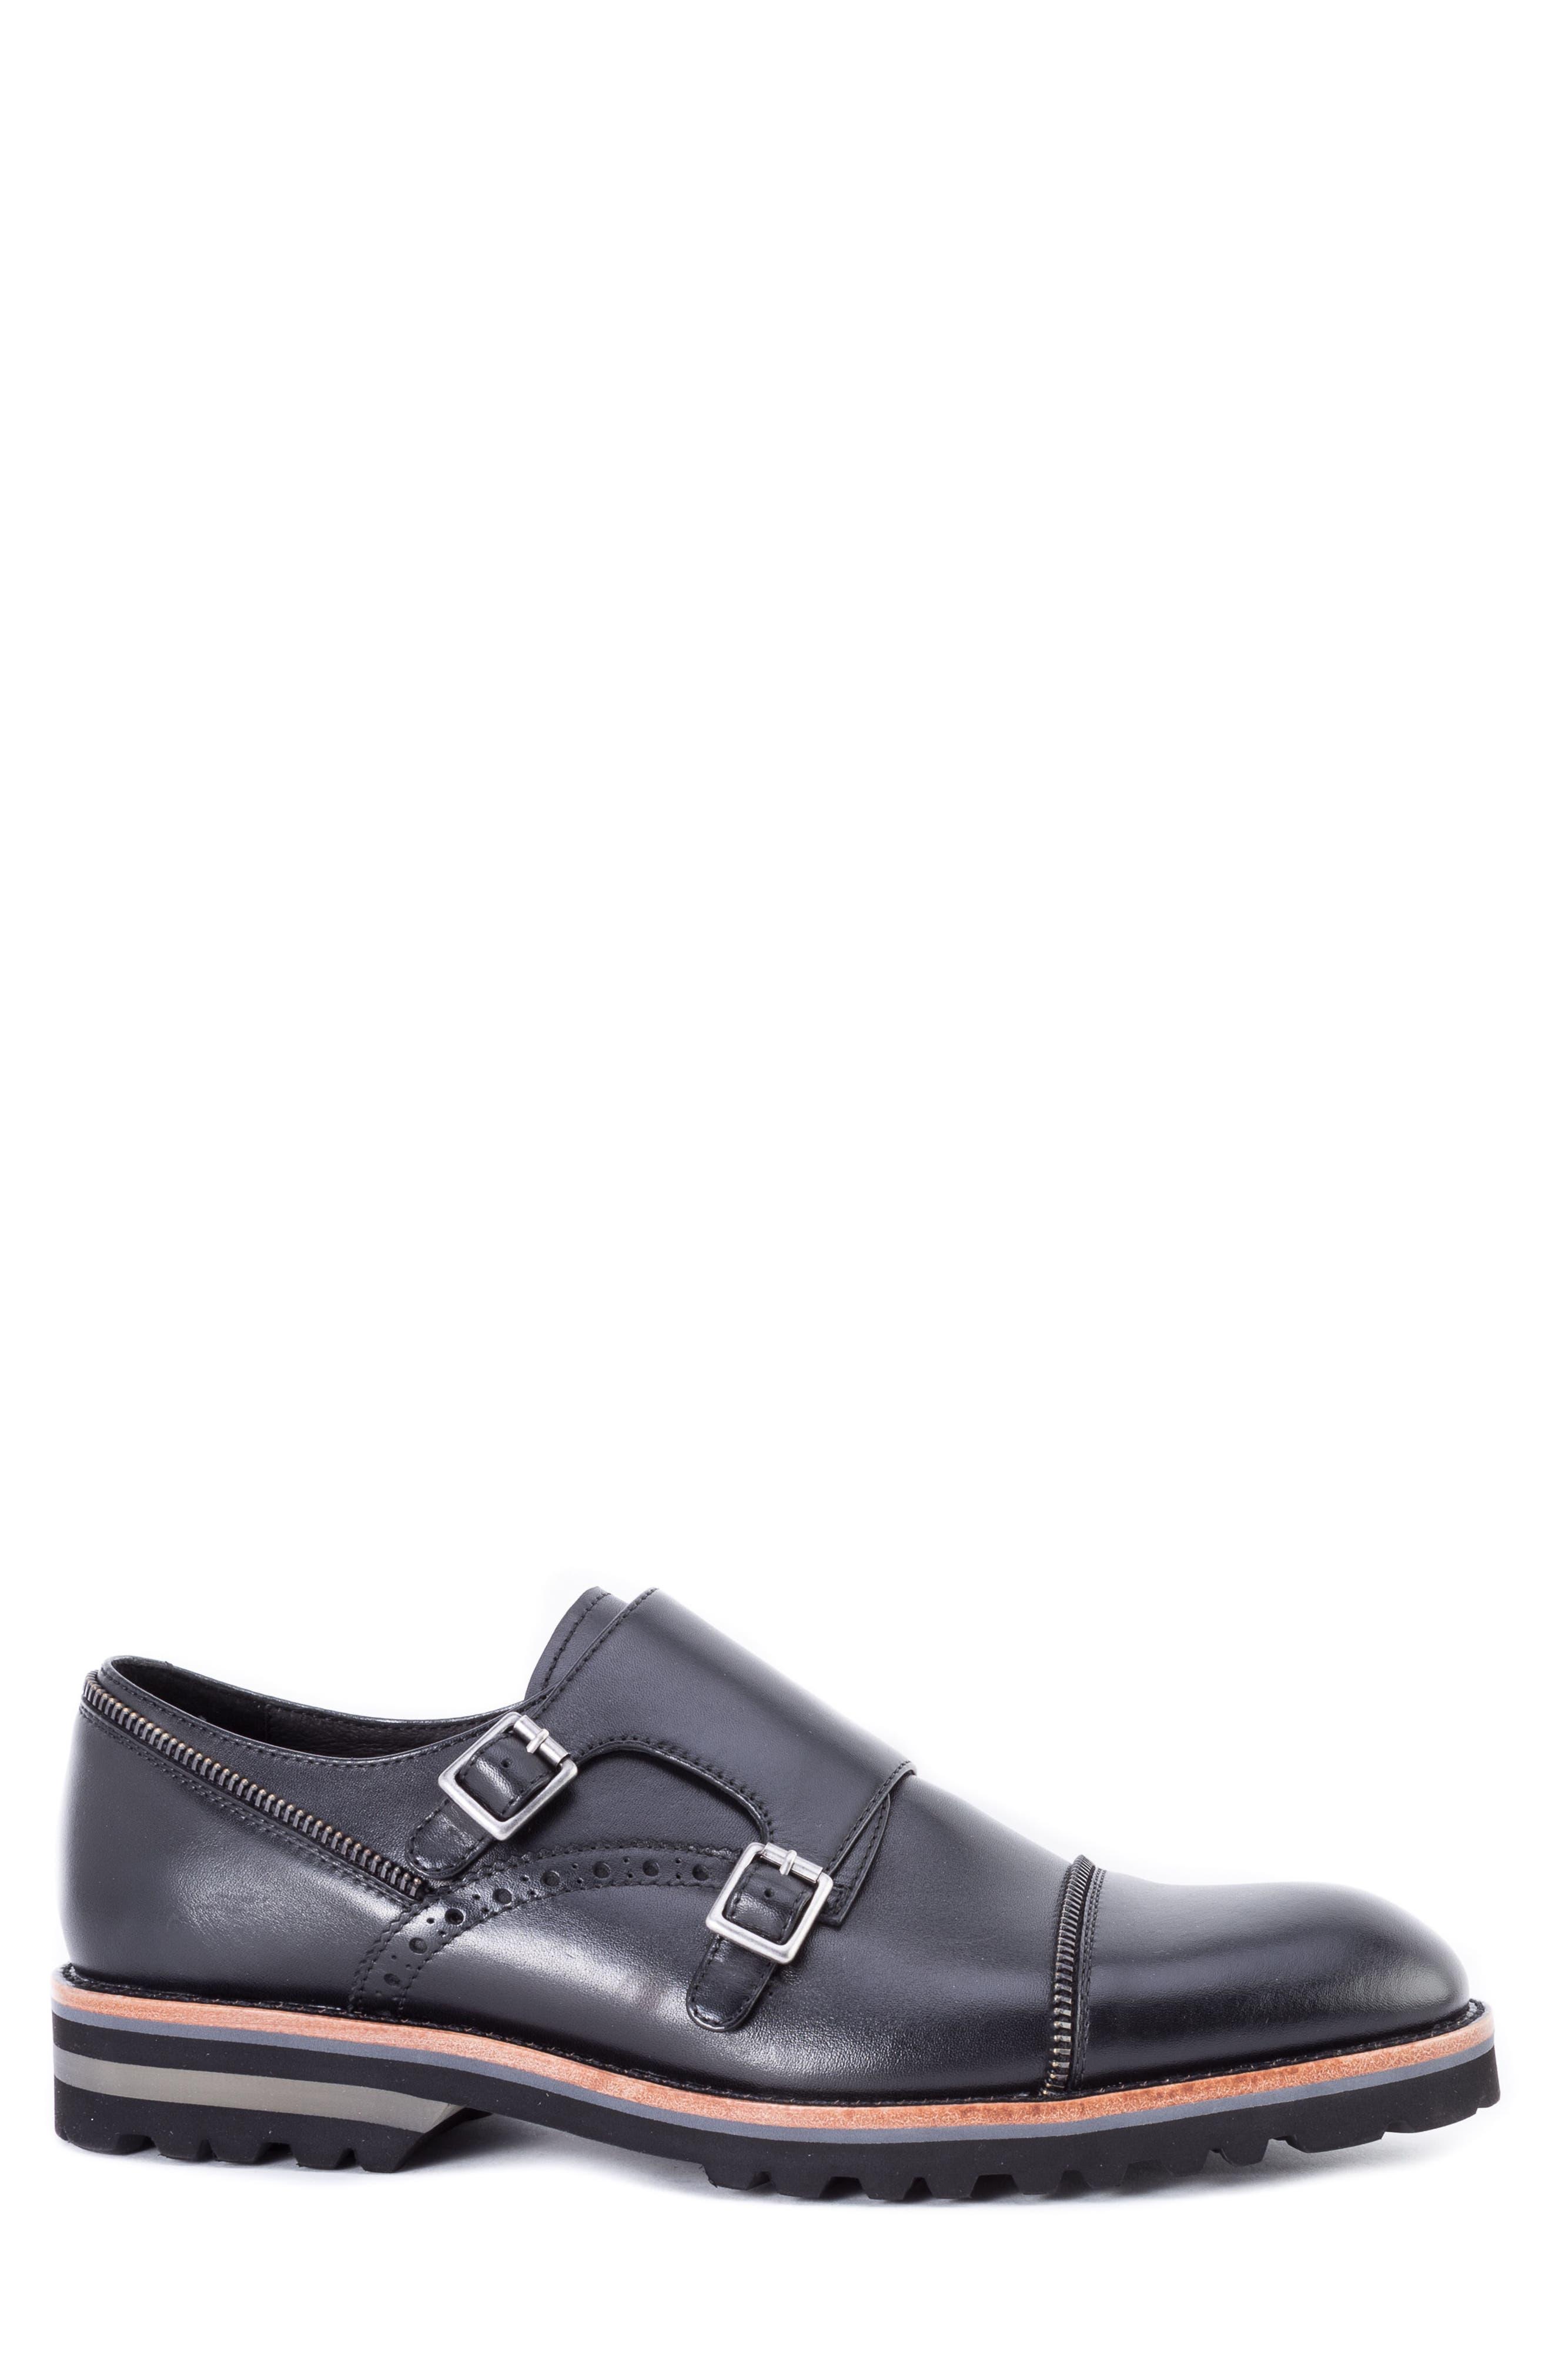 Acadia Double Buckle Monk Shoe,                             Alternate thumbnail 3, color,                             BLACK LEATHER